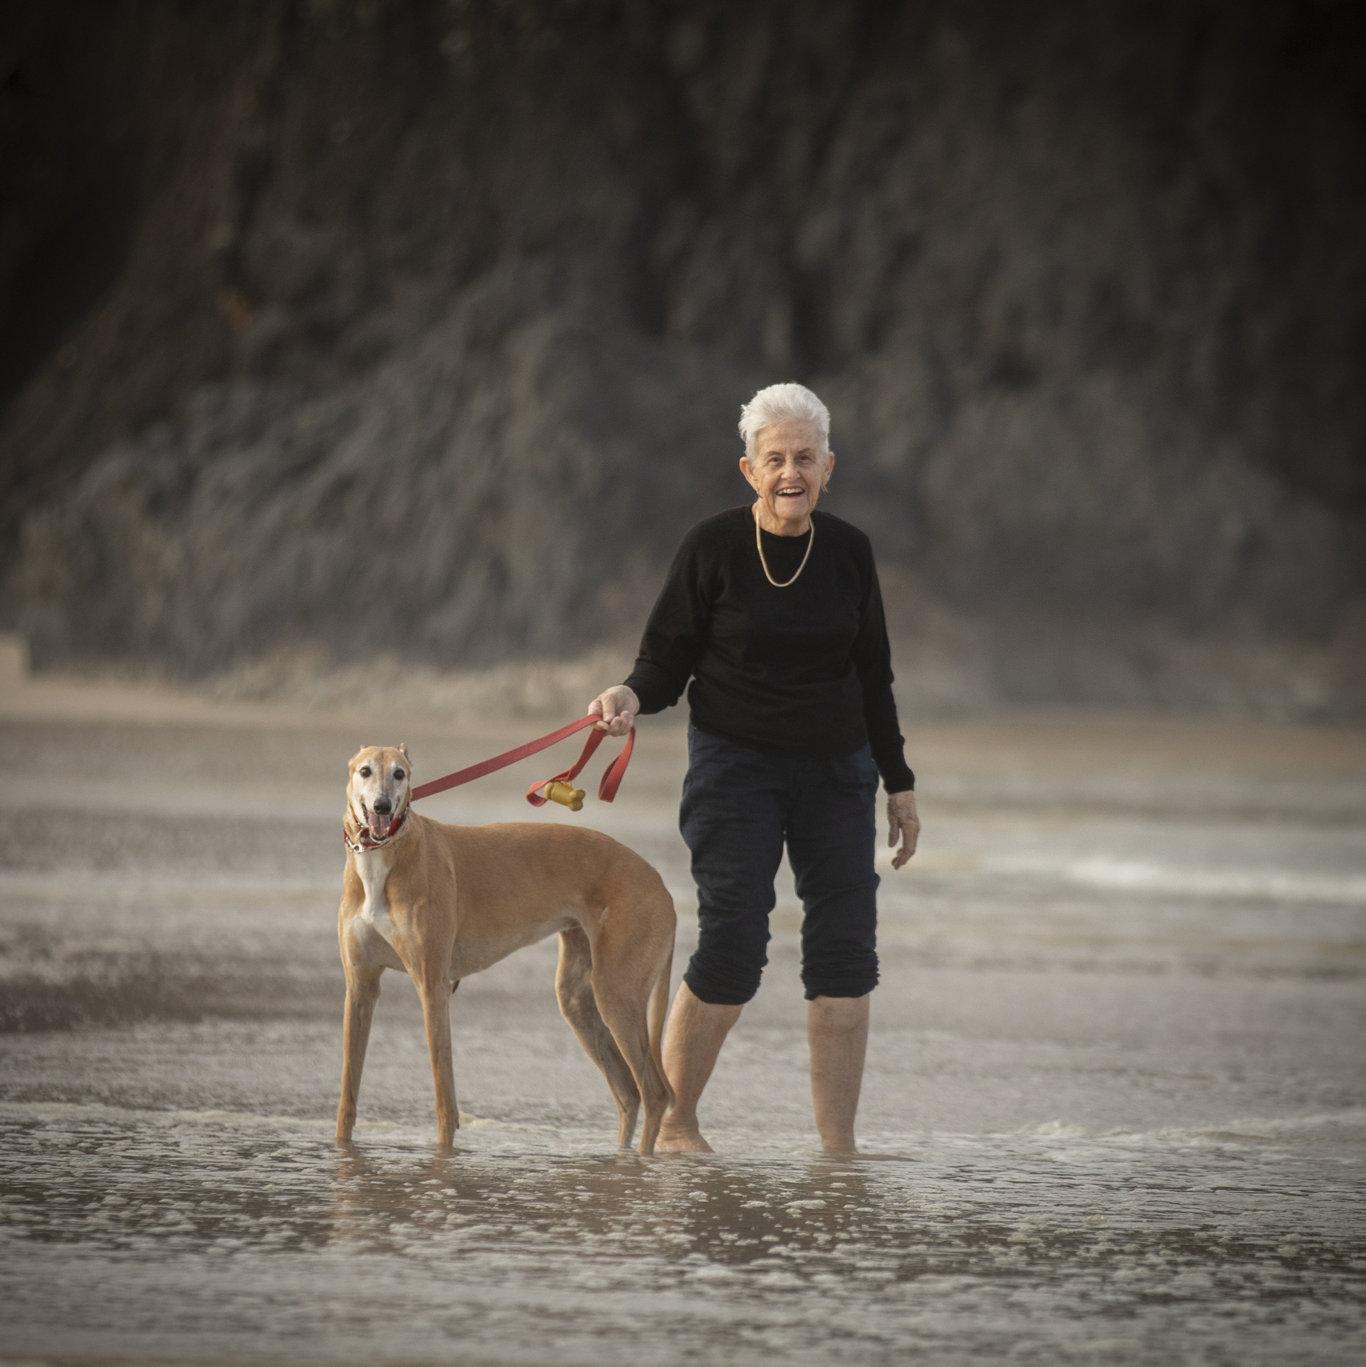 Jan Cruickshank, 78, of Banora Point, NSW with her greyhound.